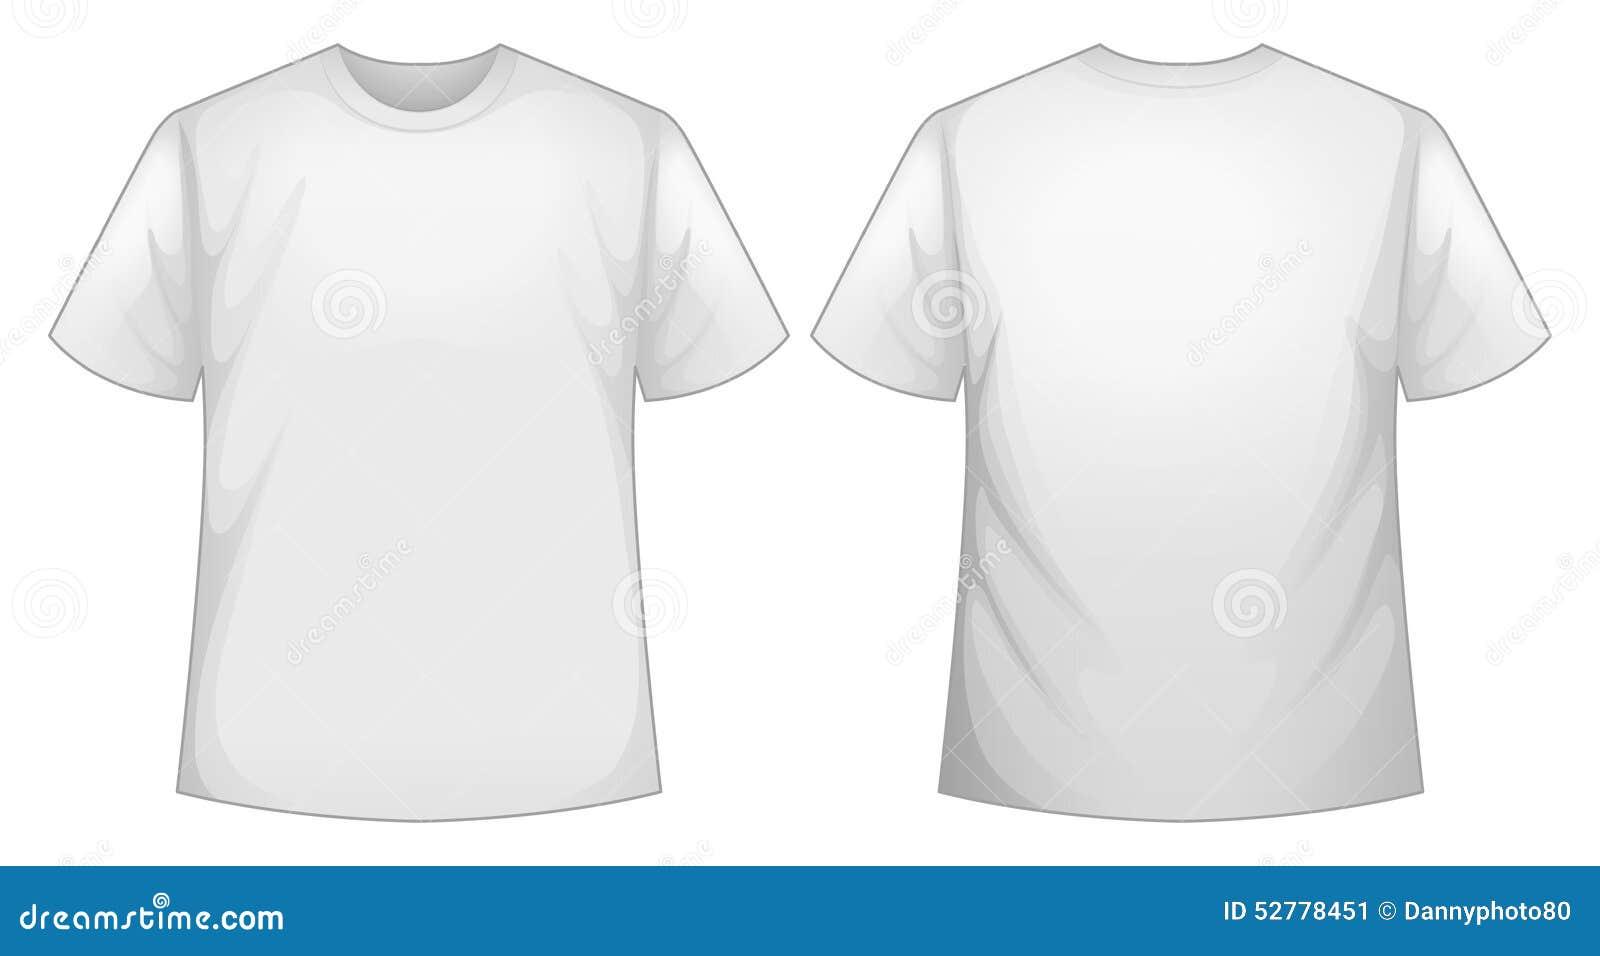 T shirt plain white back - White Shirt Stock Image